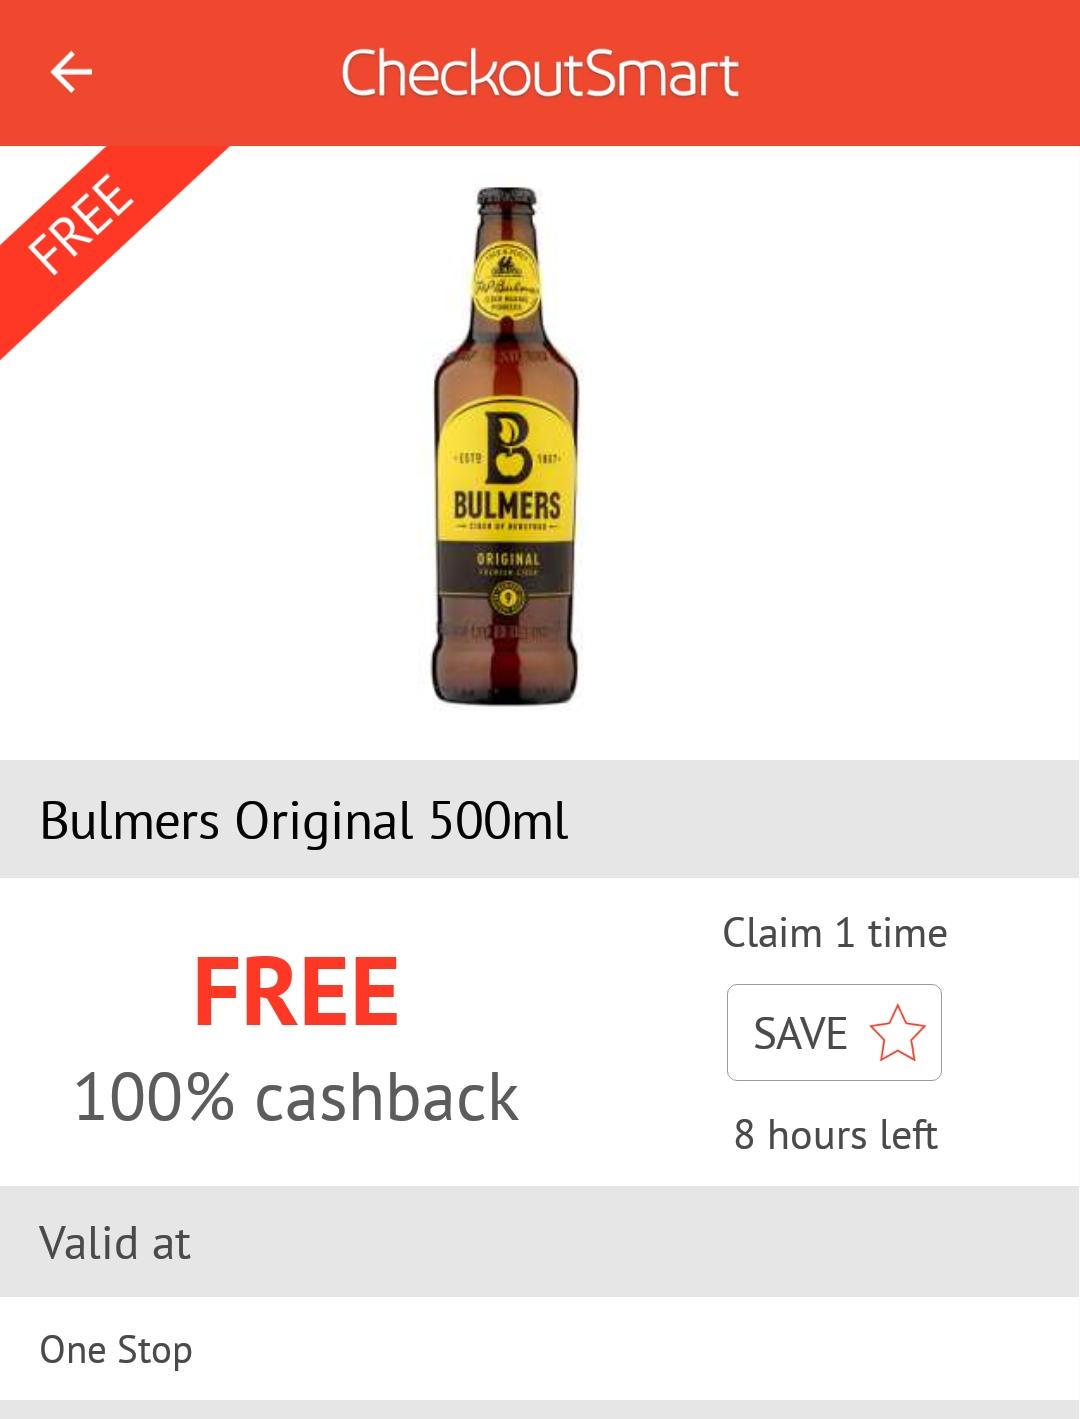 App Bottle discount offer